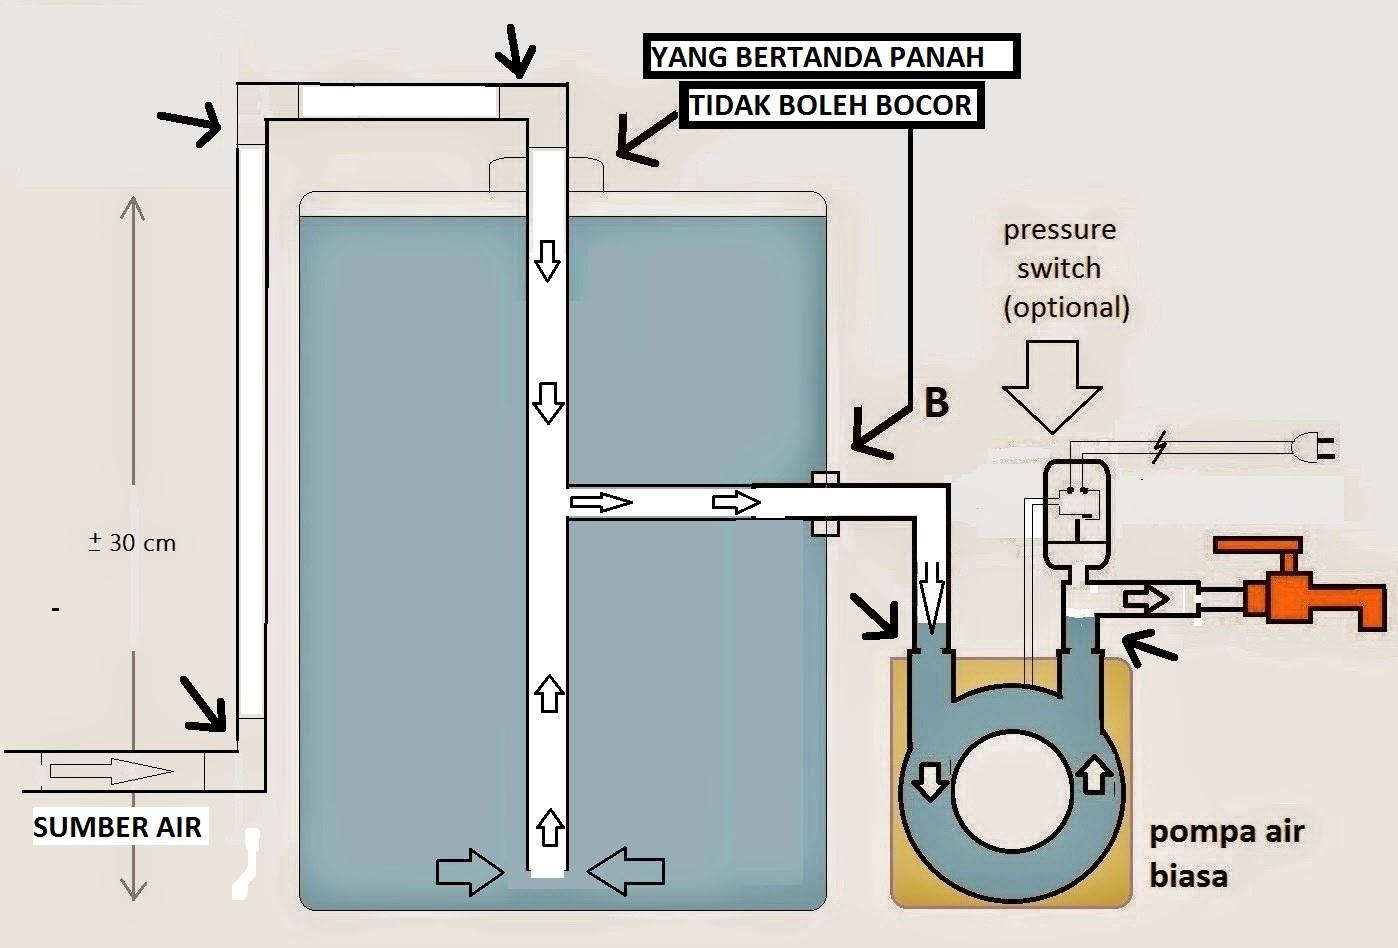 Journey Triyanto S Modifikasi Mesin Pompa Air Biasa Menjadi Otomatis